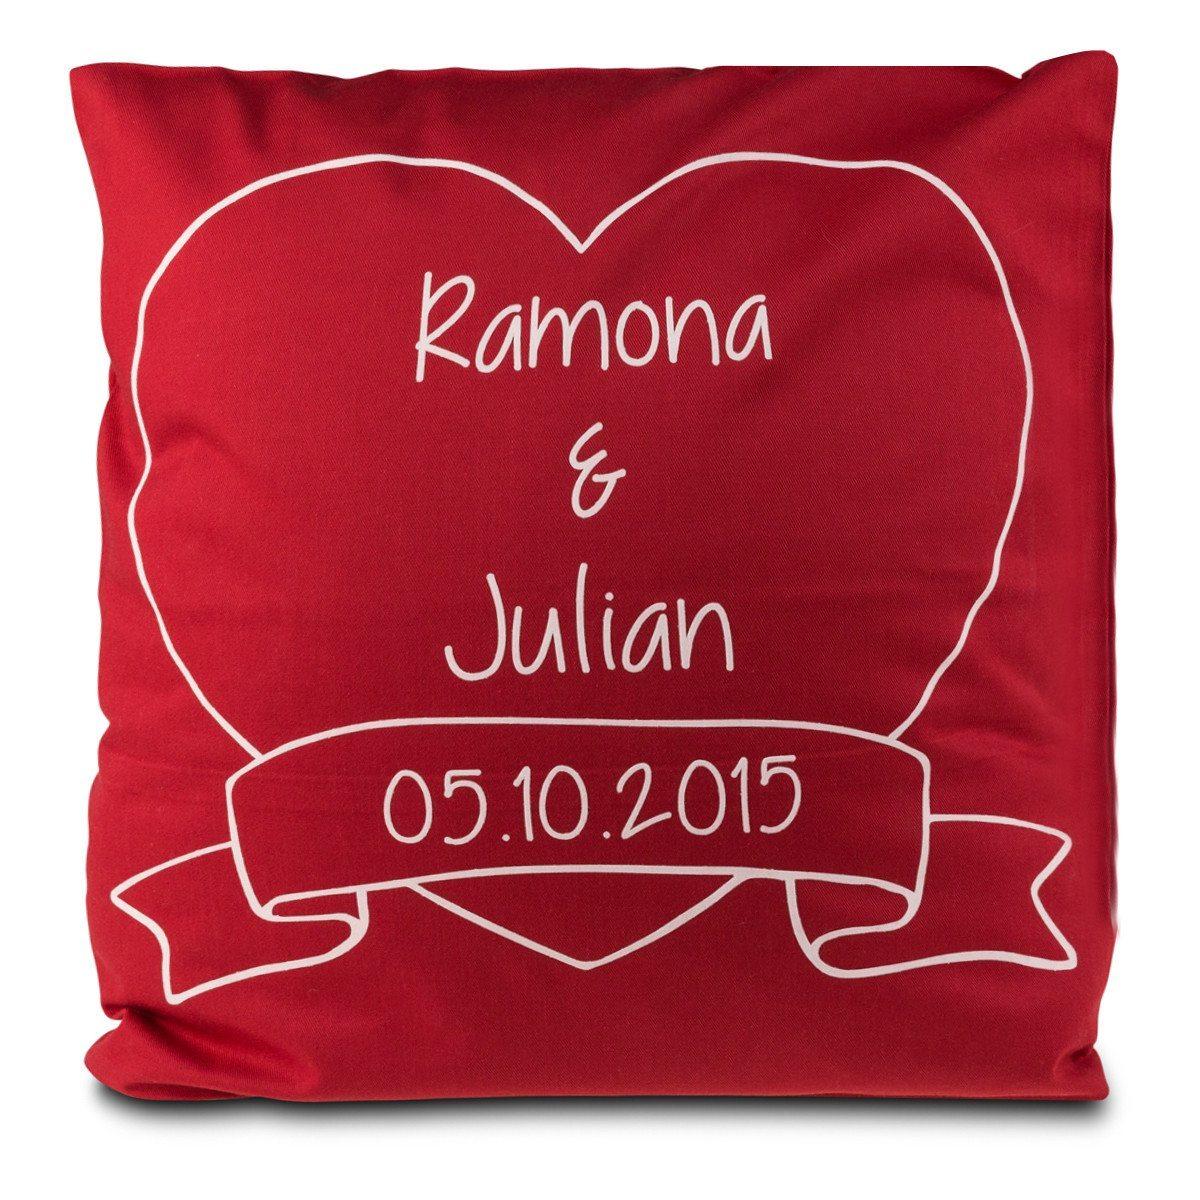 Romantik-Kissen mit Namen